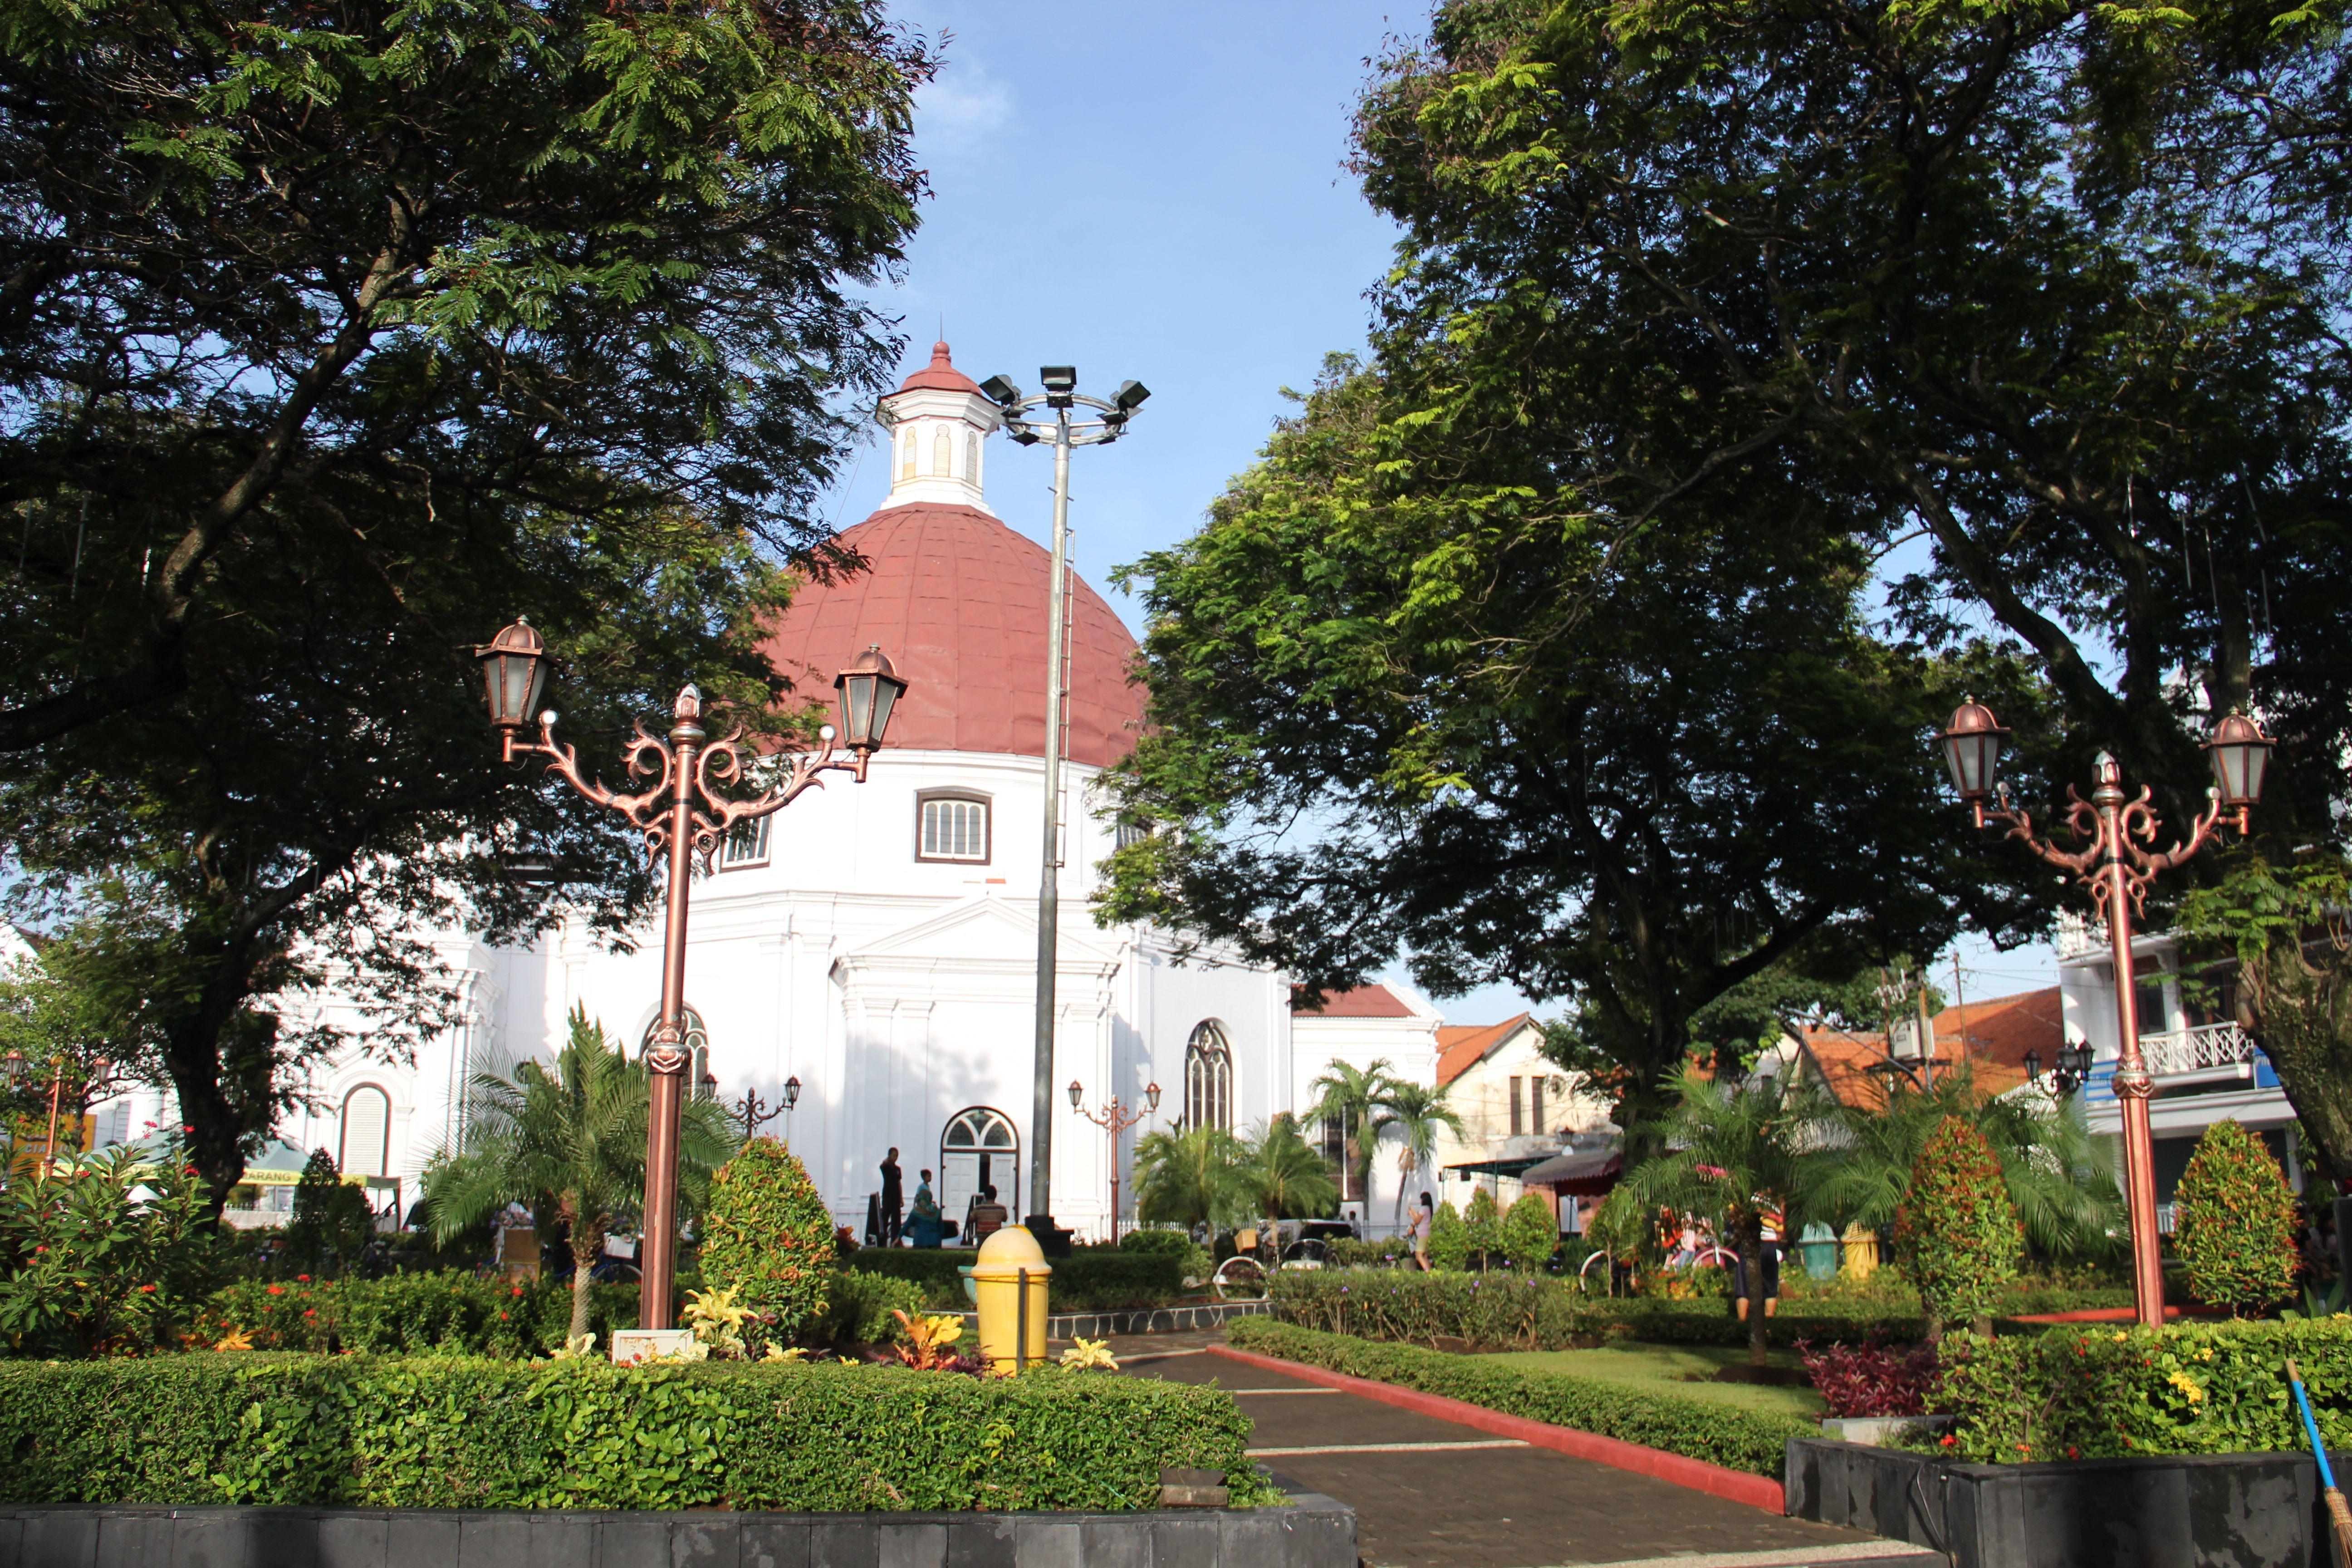 Beauty Park City Semarang English Bangunan Tua Kota Suasana Eropa